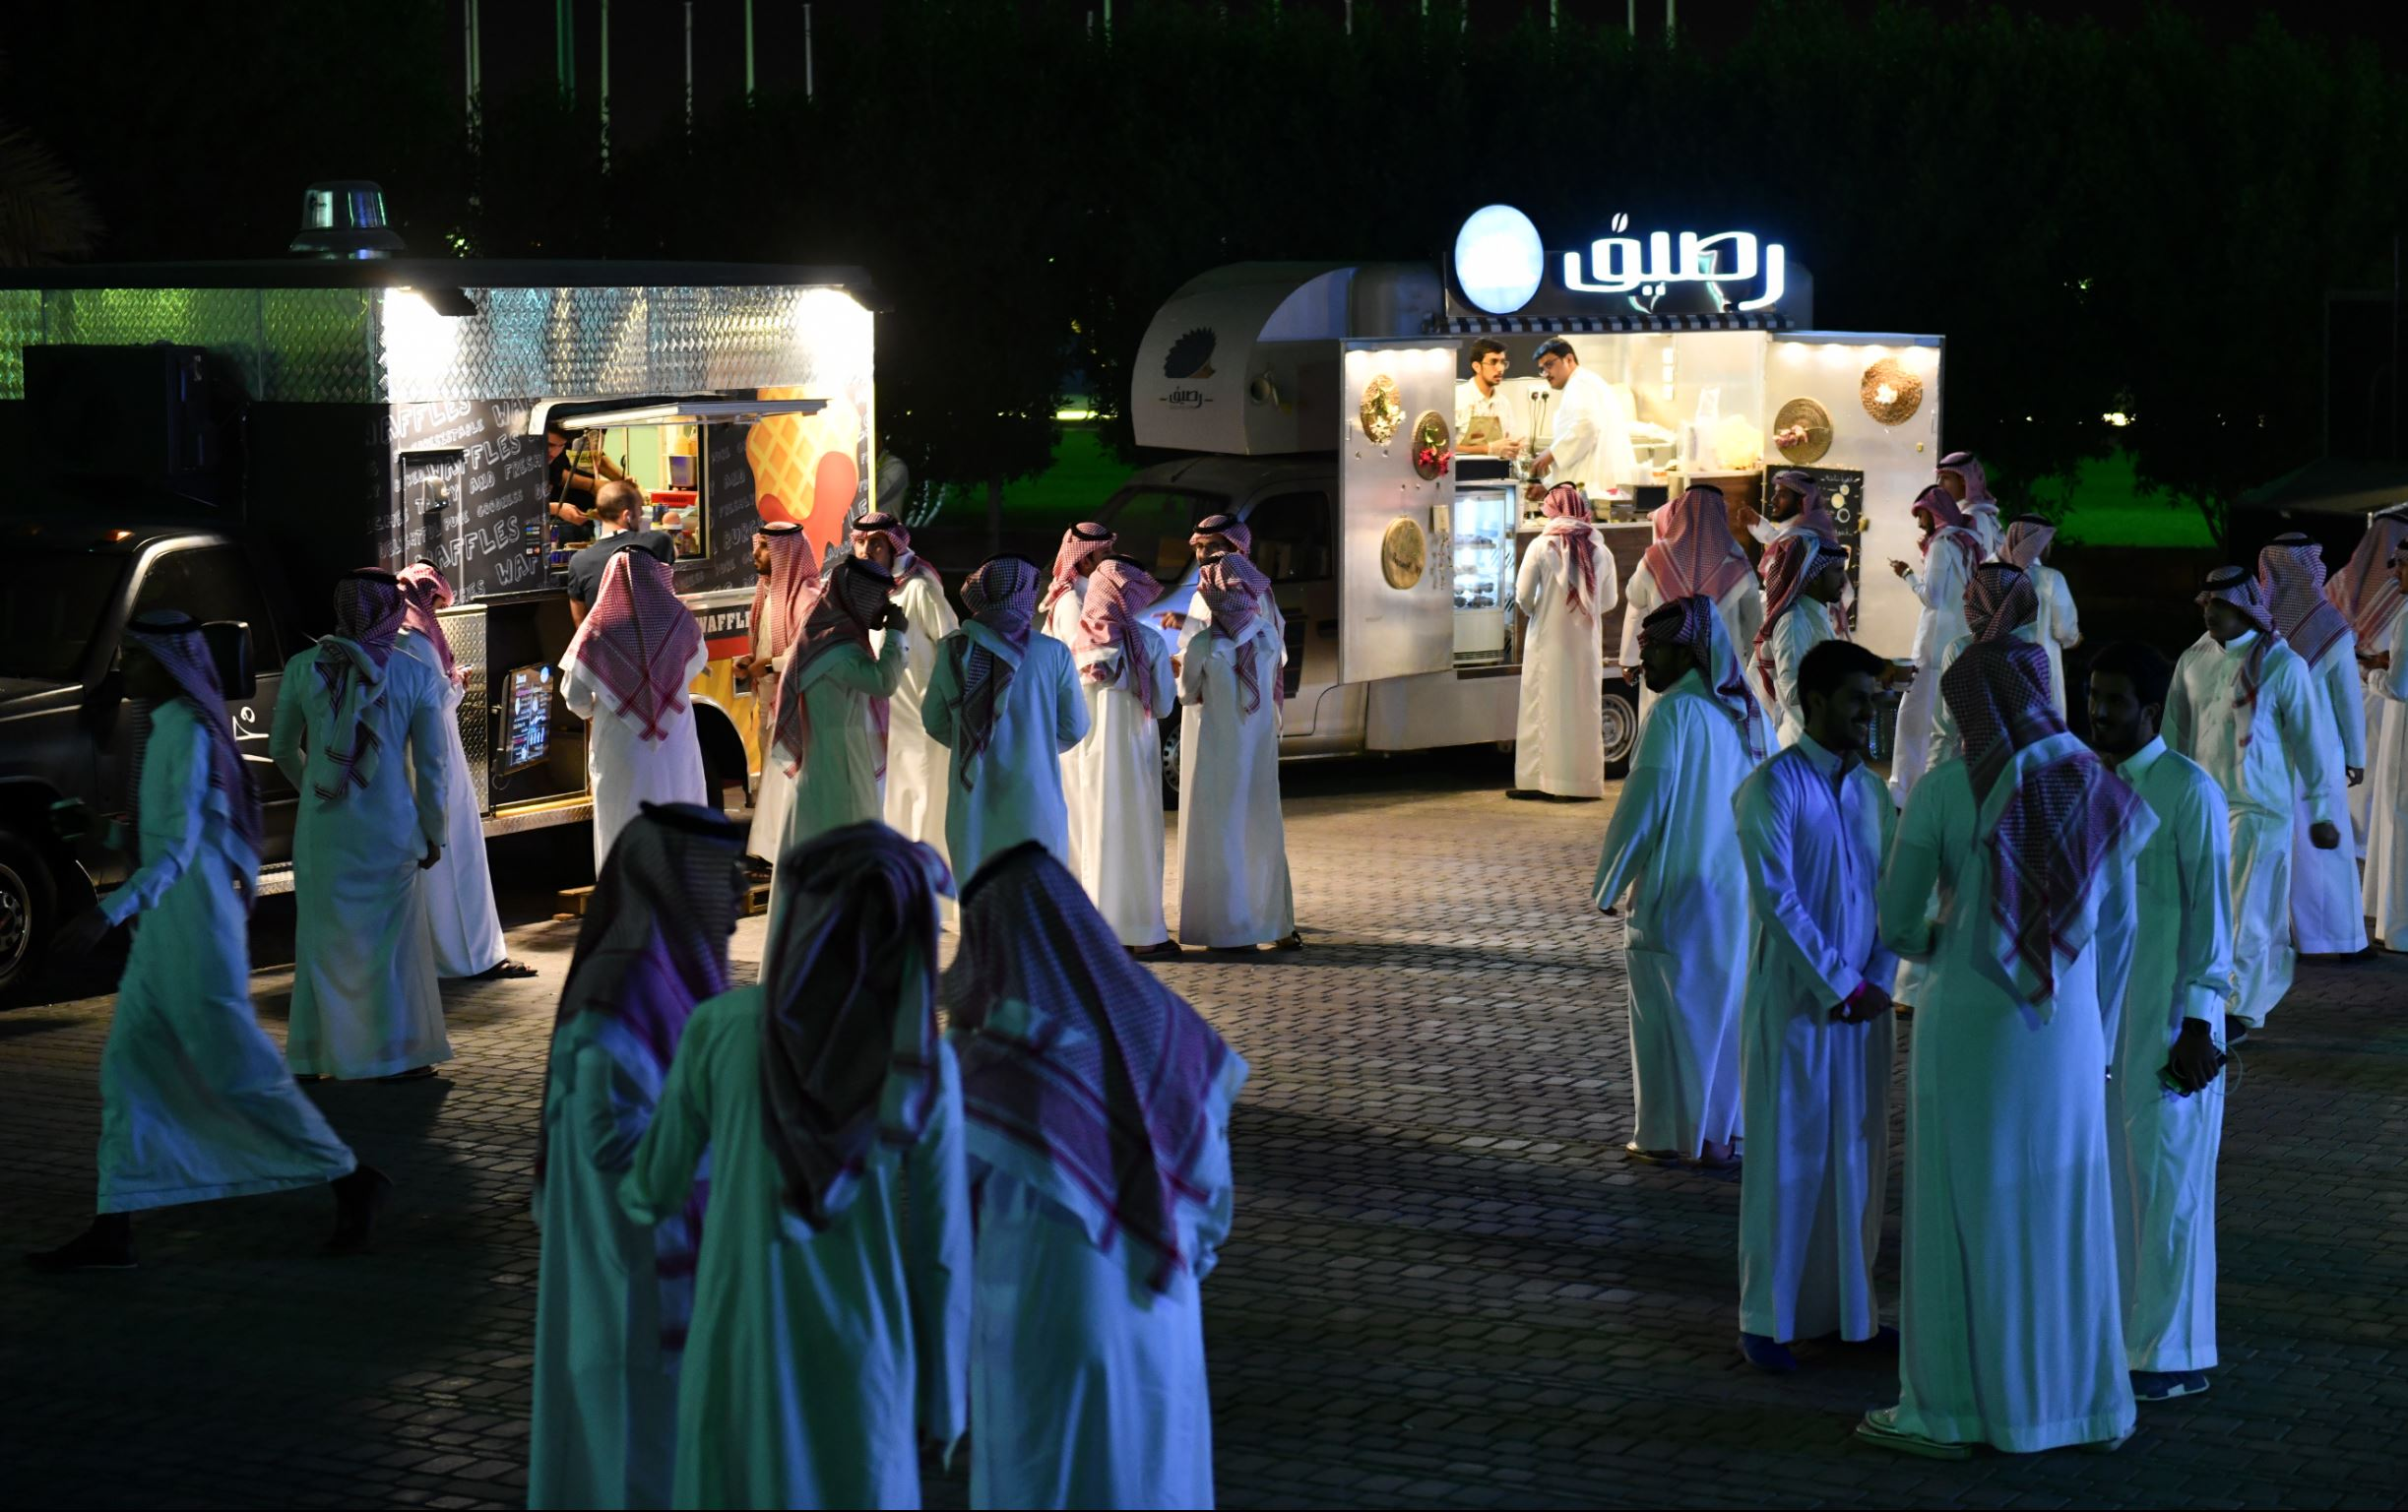 Les food-trucks devant la salle de concert.